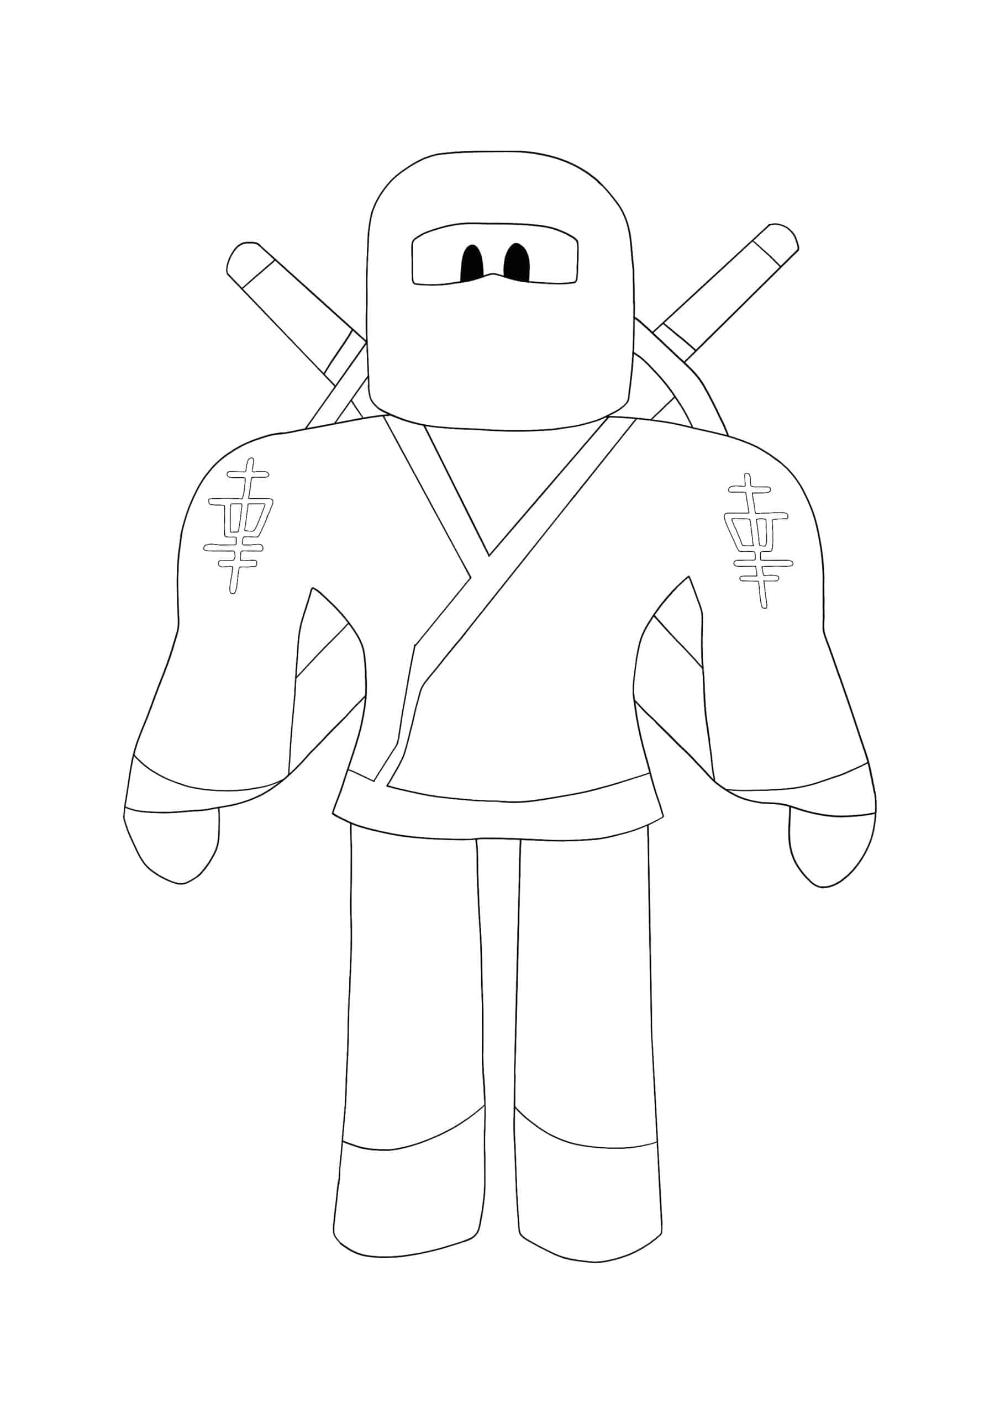 Roblox Ninja Coloring Pages 2 Free Coloring Sheets 2021 In 2021 Free Coloring Sheets Coloring Pages Free Coloring